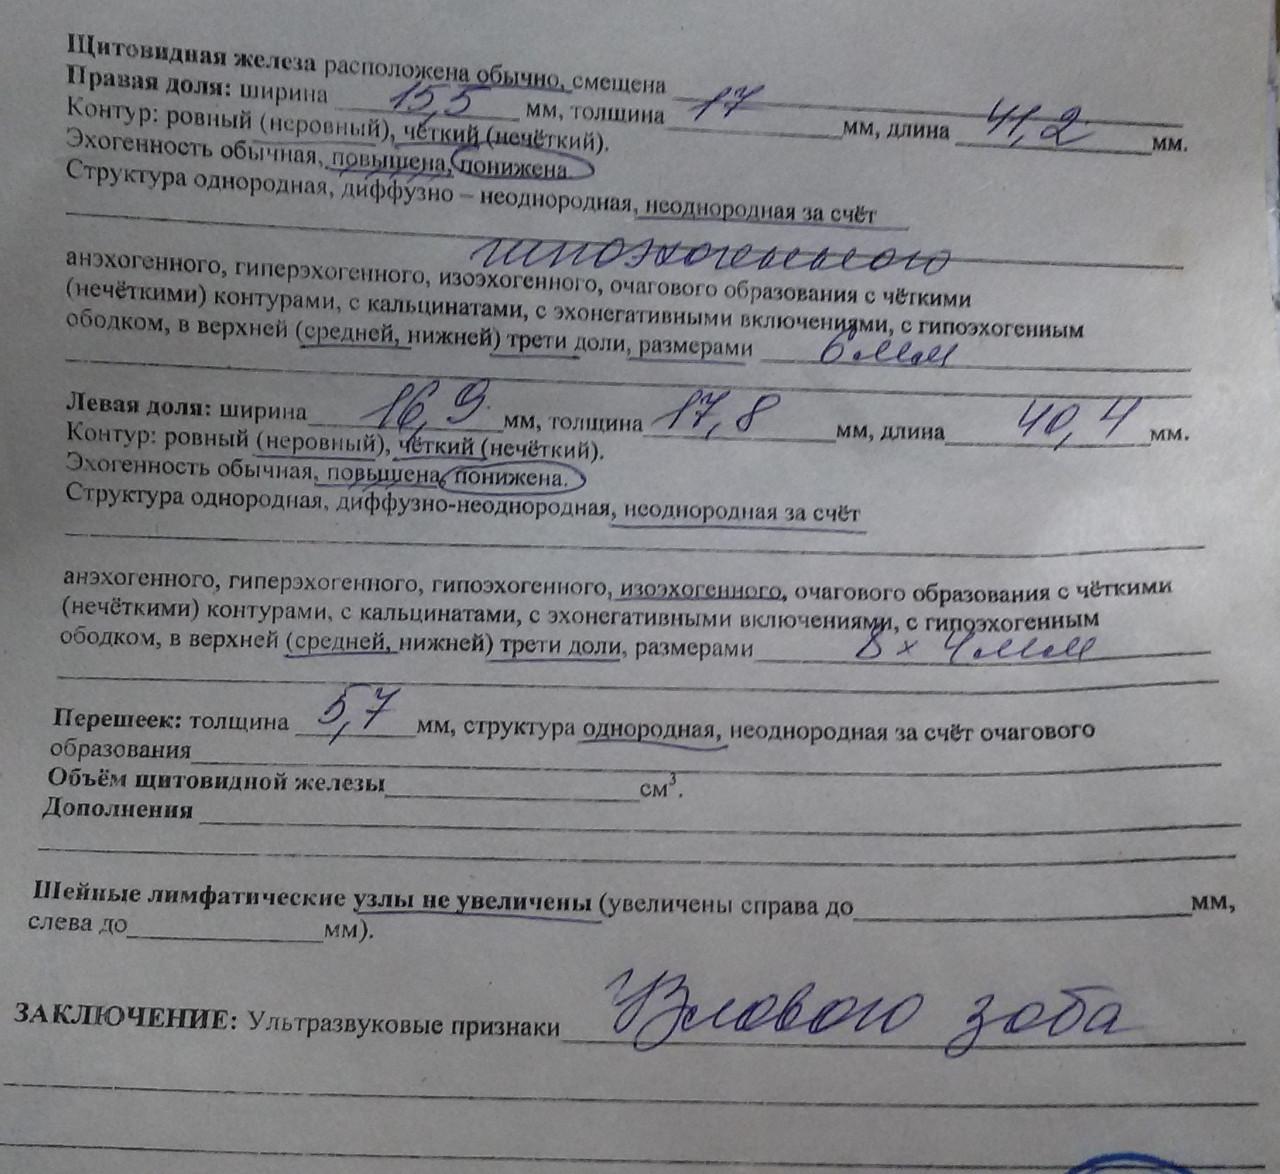 Узлы щитовидной железы - Вопрос эндокринологу - 03 Онлайн: http://03online.com/news/uzly_shchitovidnoy_zhelezy/2016-12-22-232663